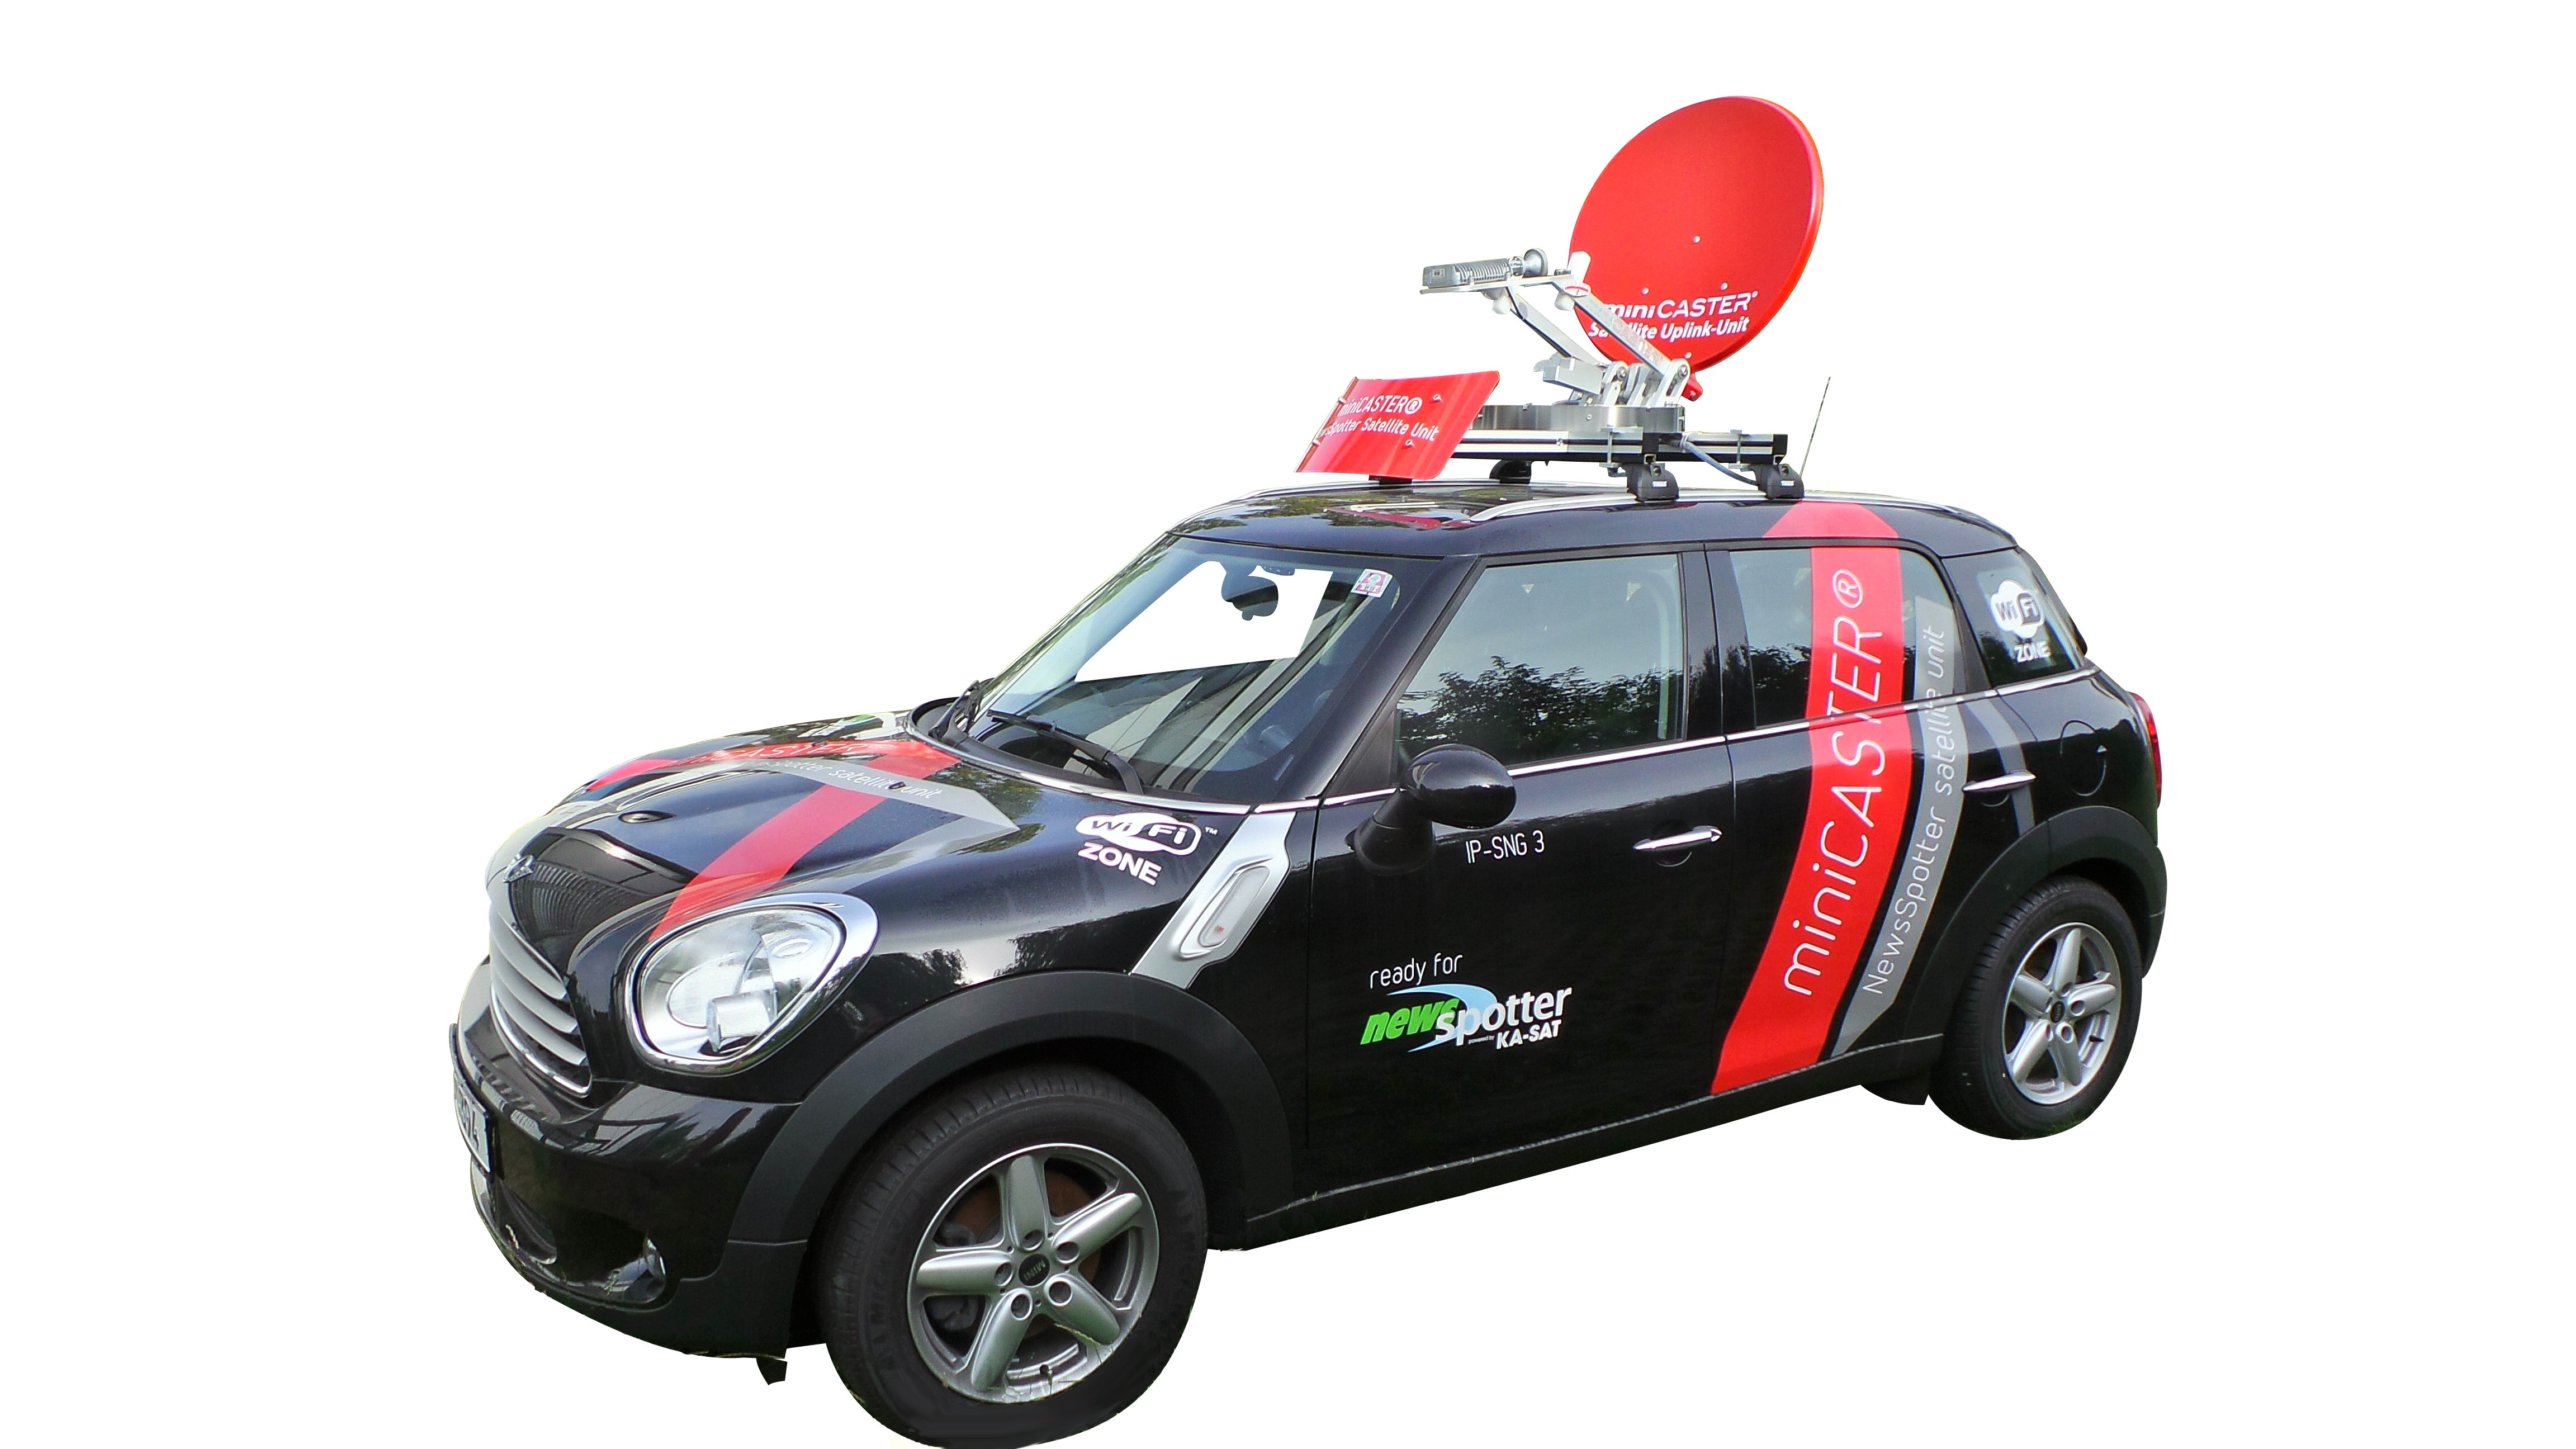 Satellite-Uplink NewsSpotter Car Unit